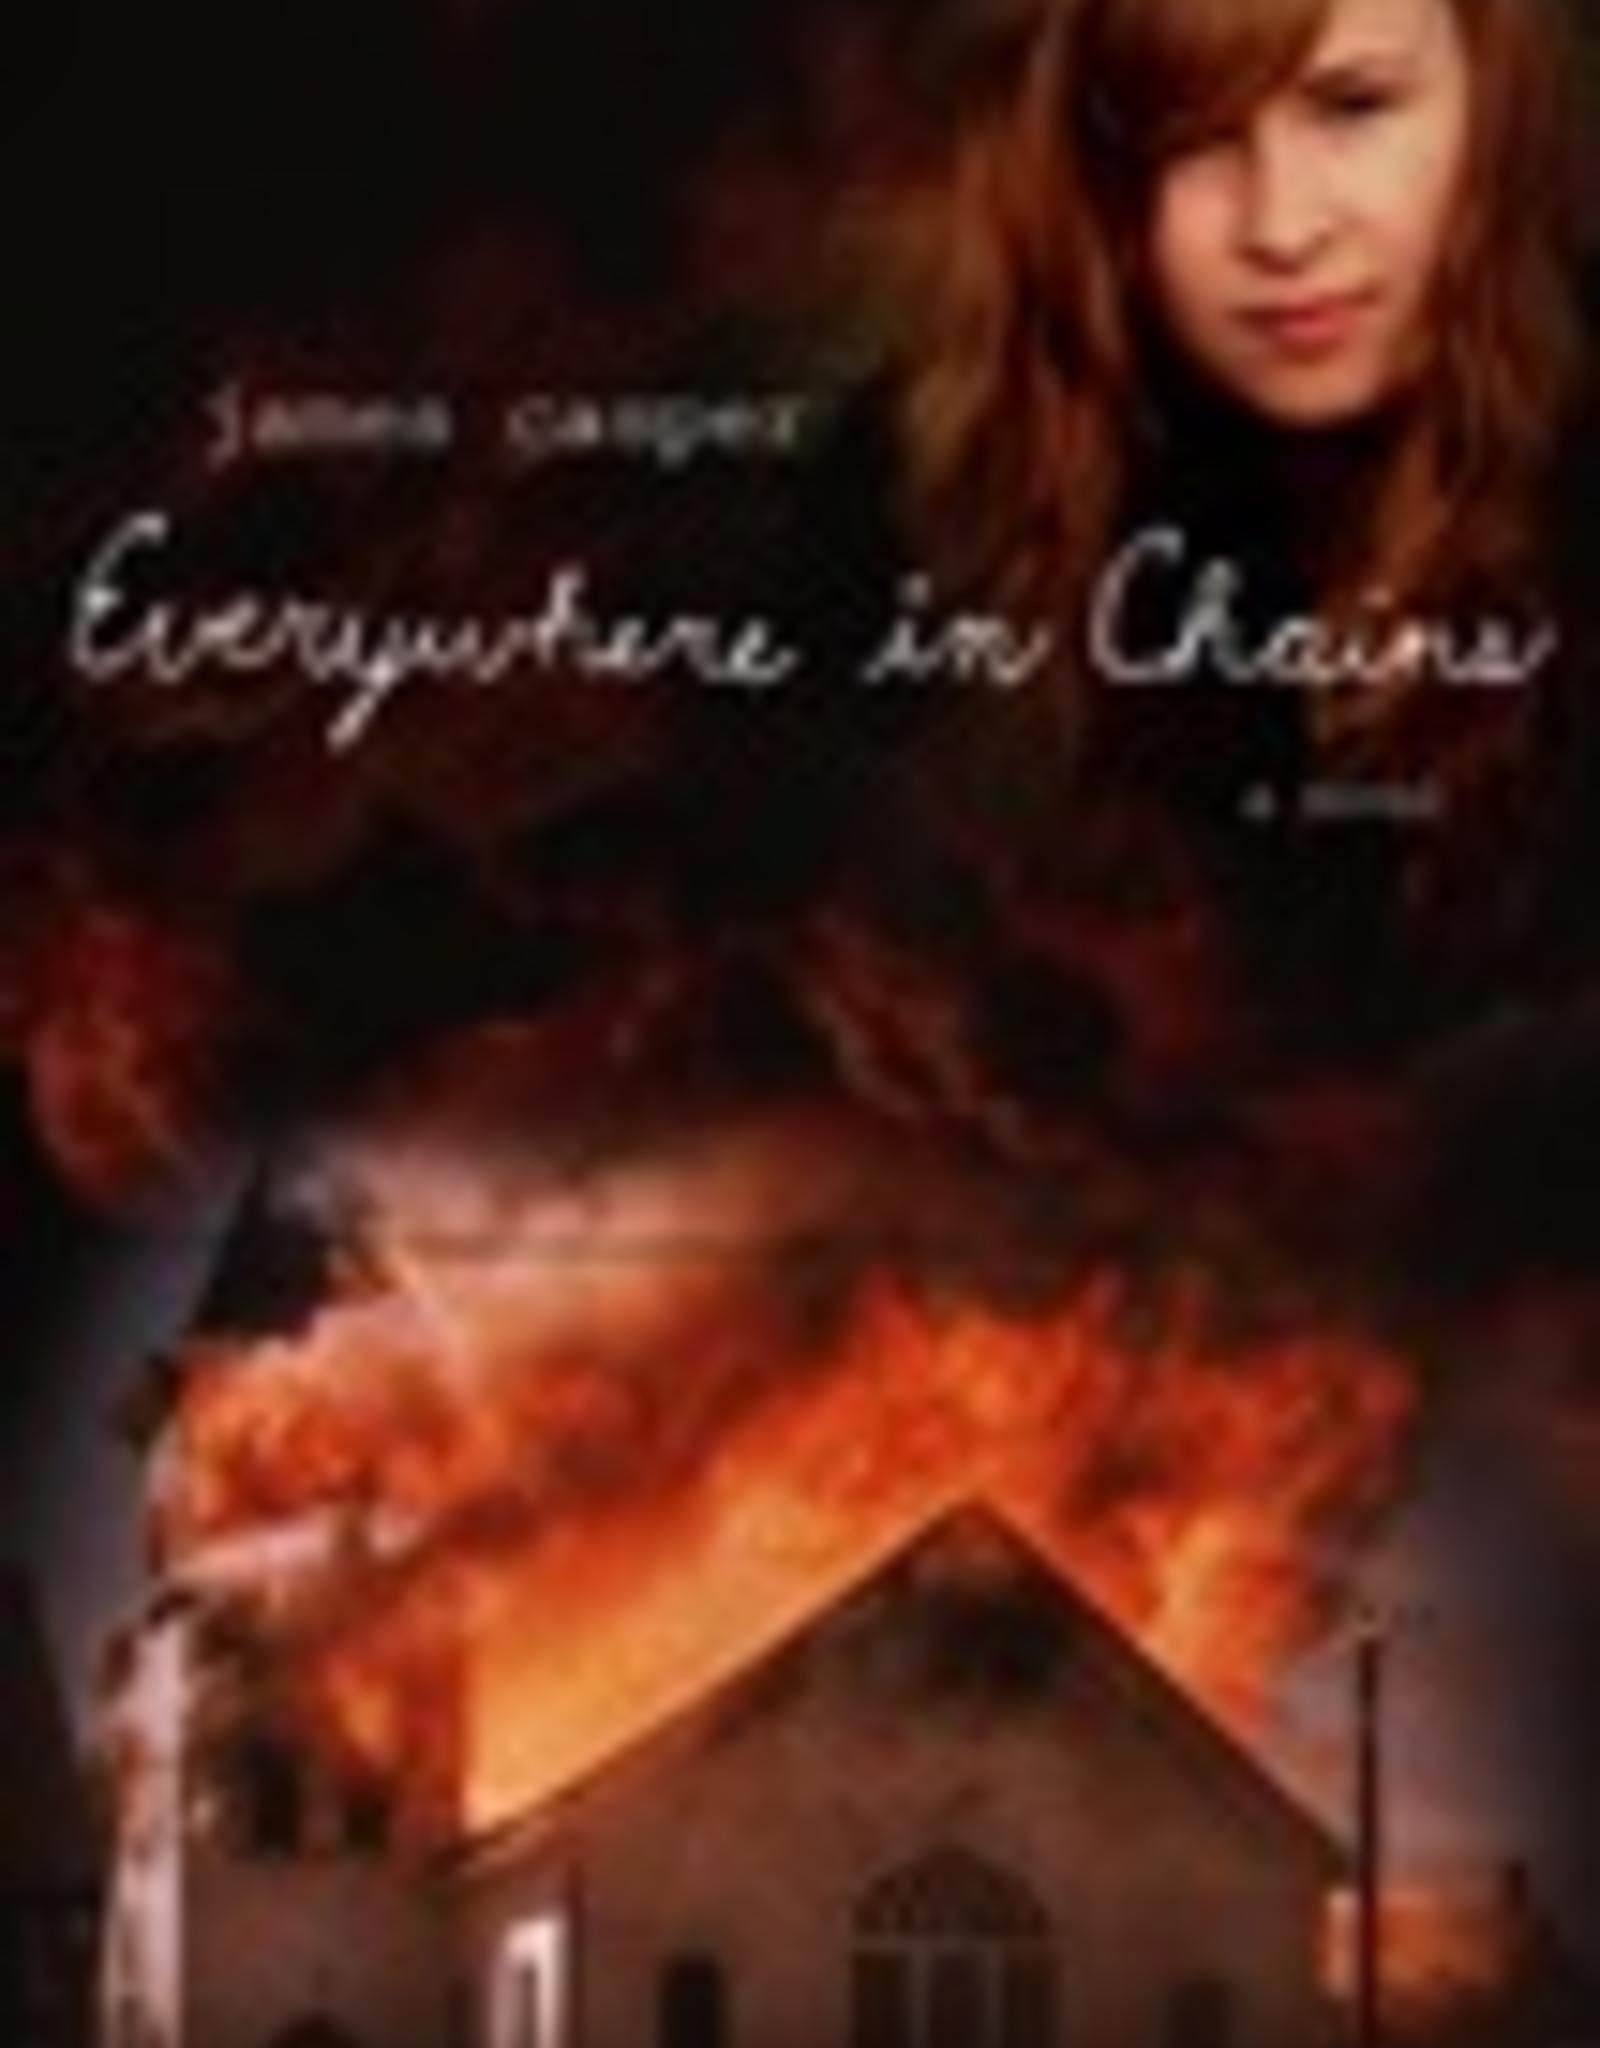 Ignatius Press Everywhere in Chains:  A Novel, by James Casper (hardcover)